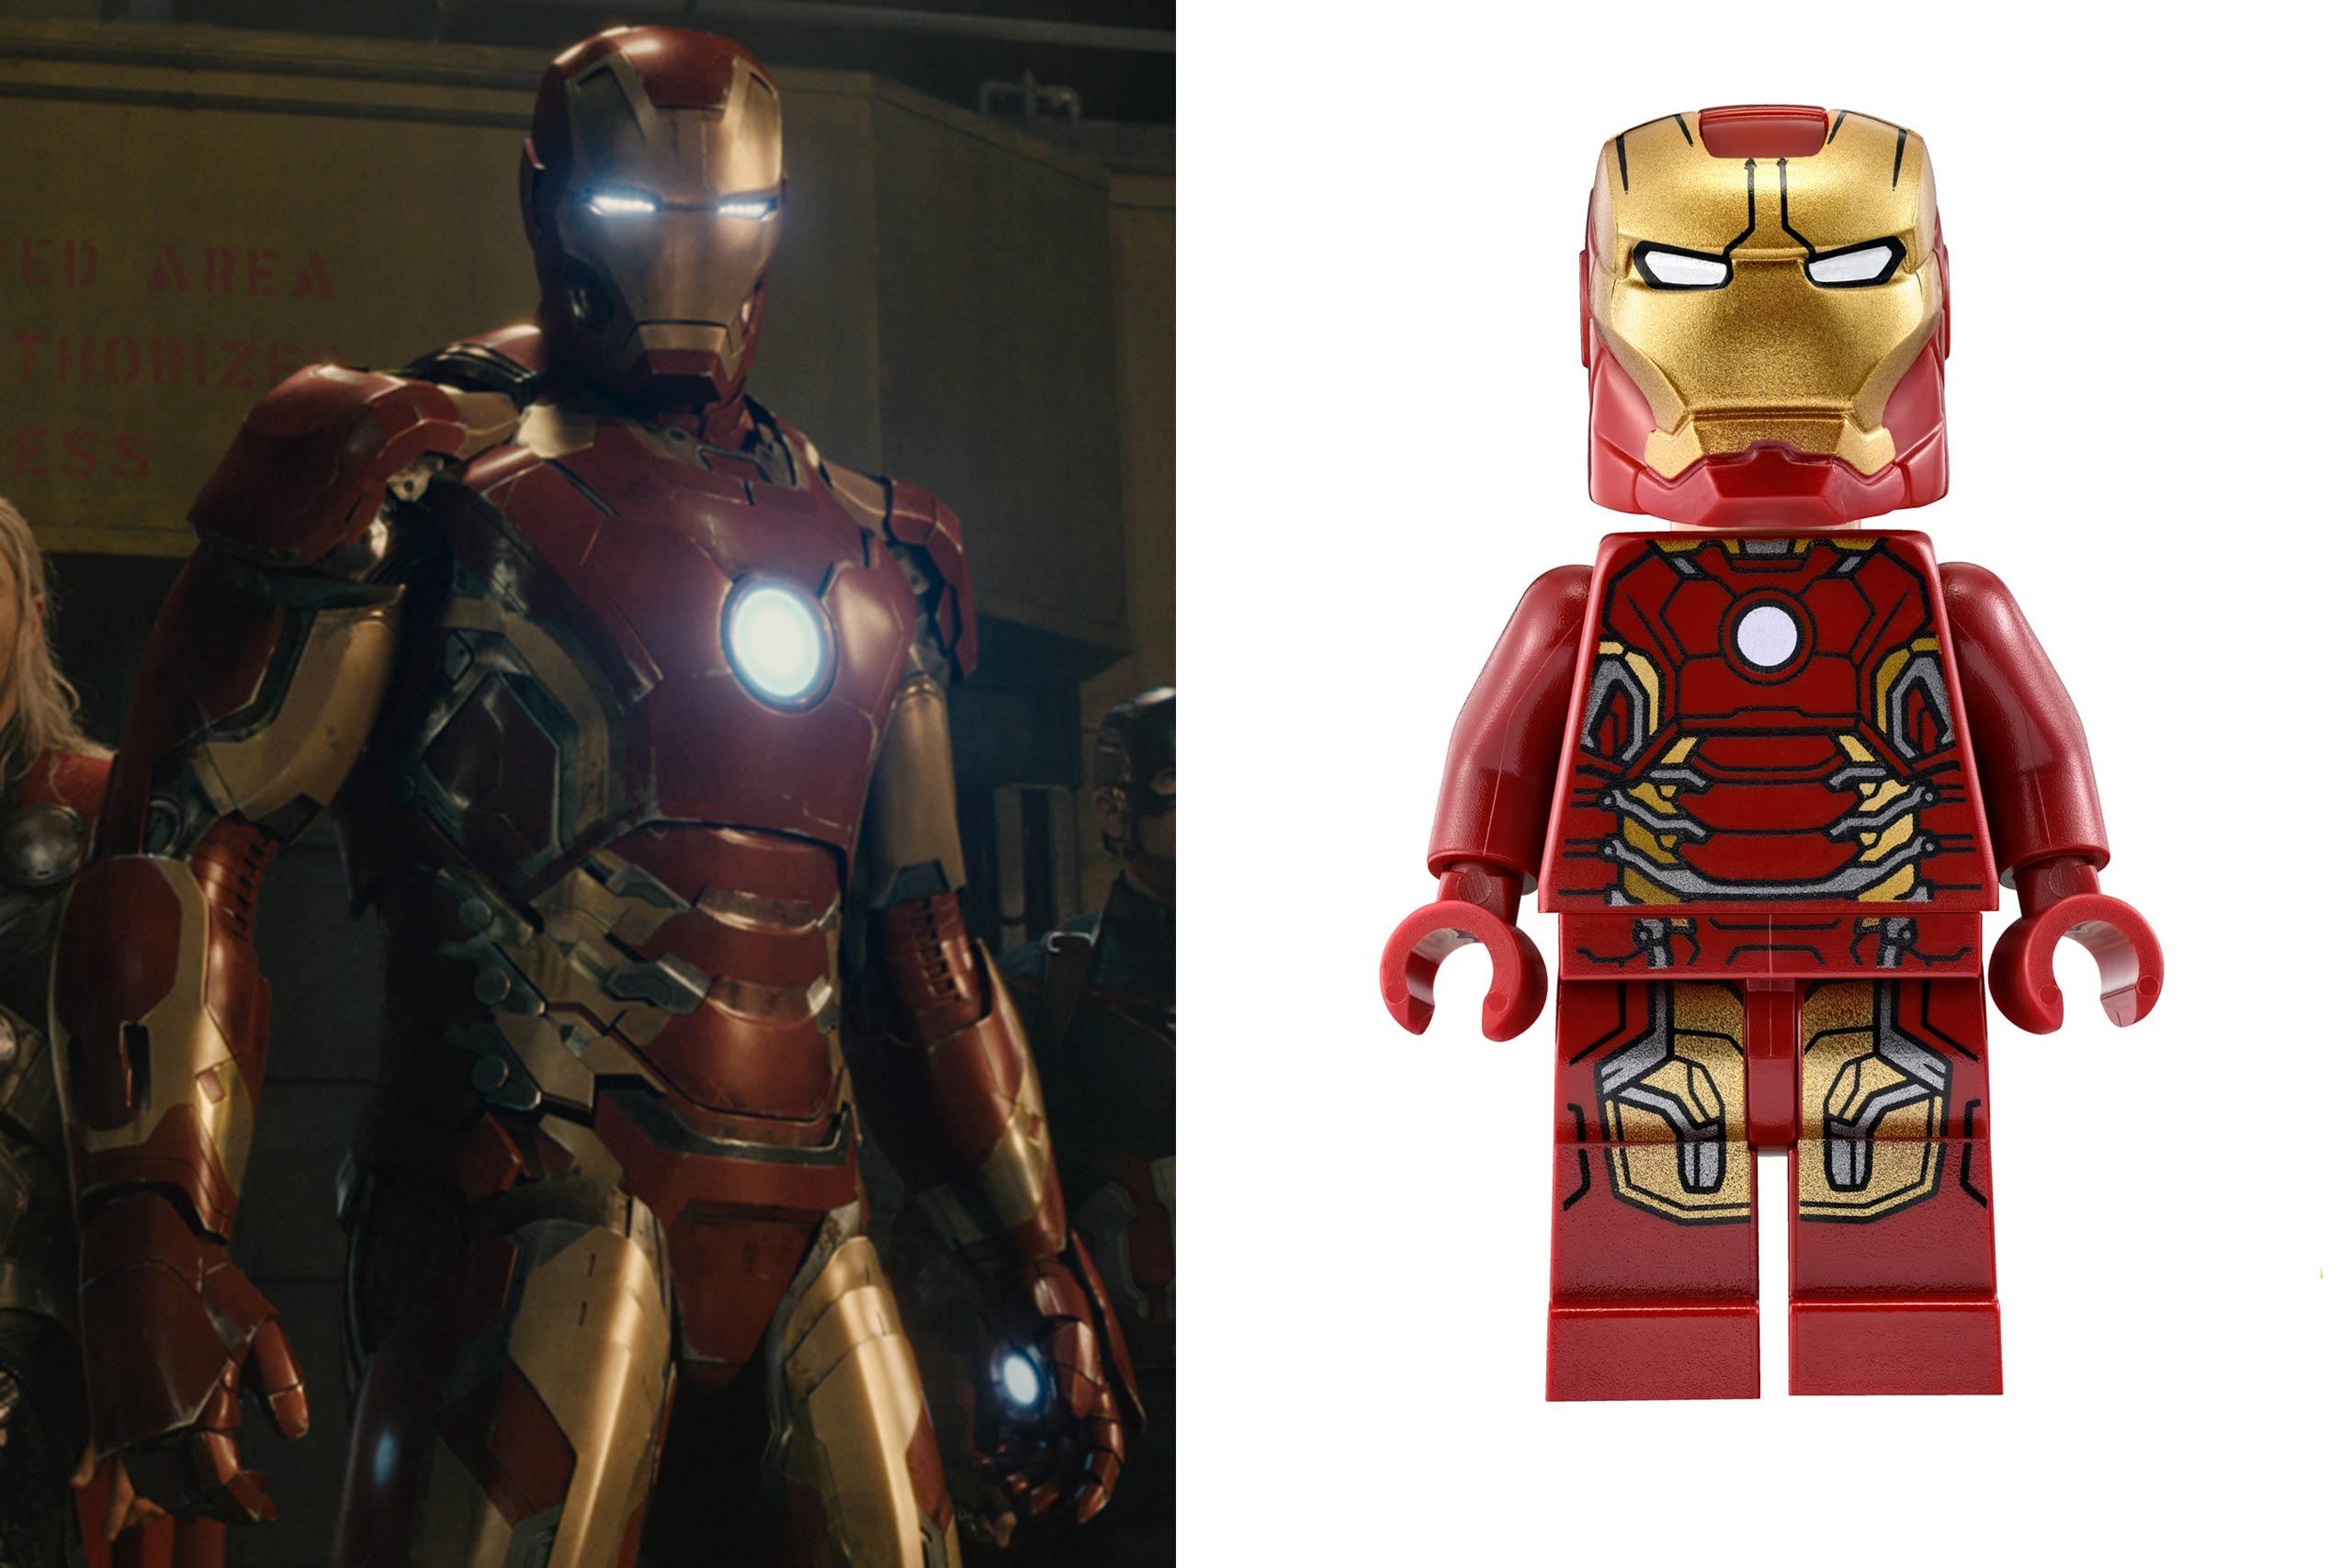 <strong>Robert Downey Jr.: Iron Man</strong>